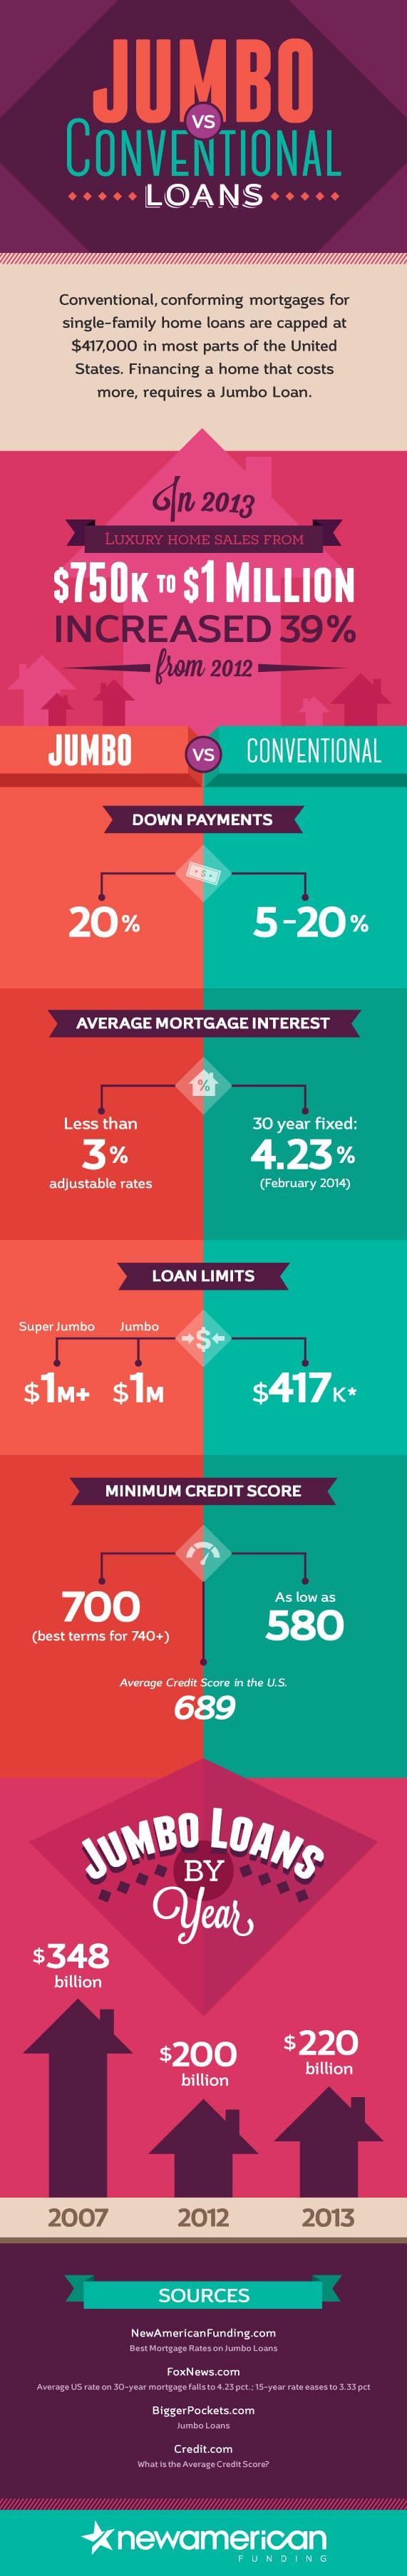 Jumbo vs. Conventional Loans